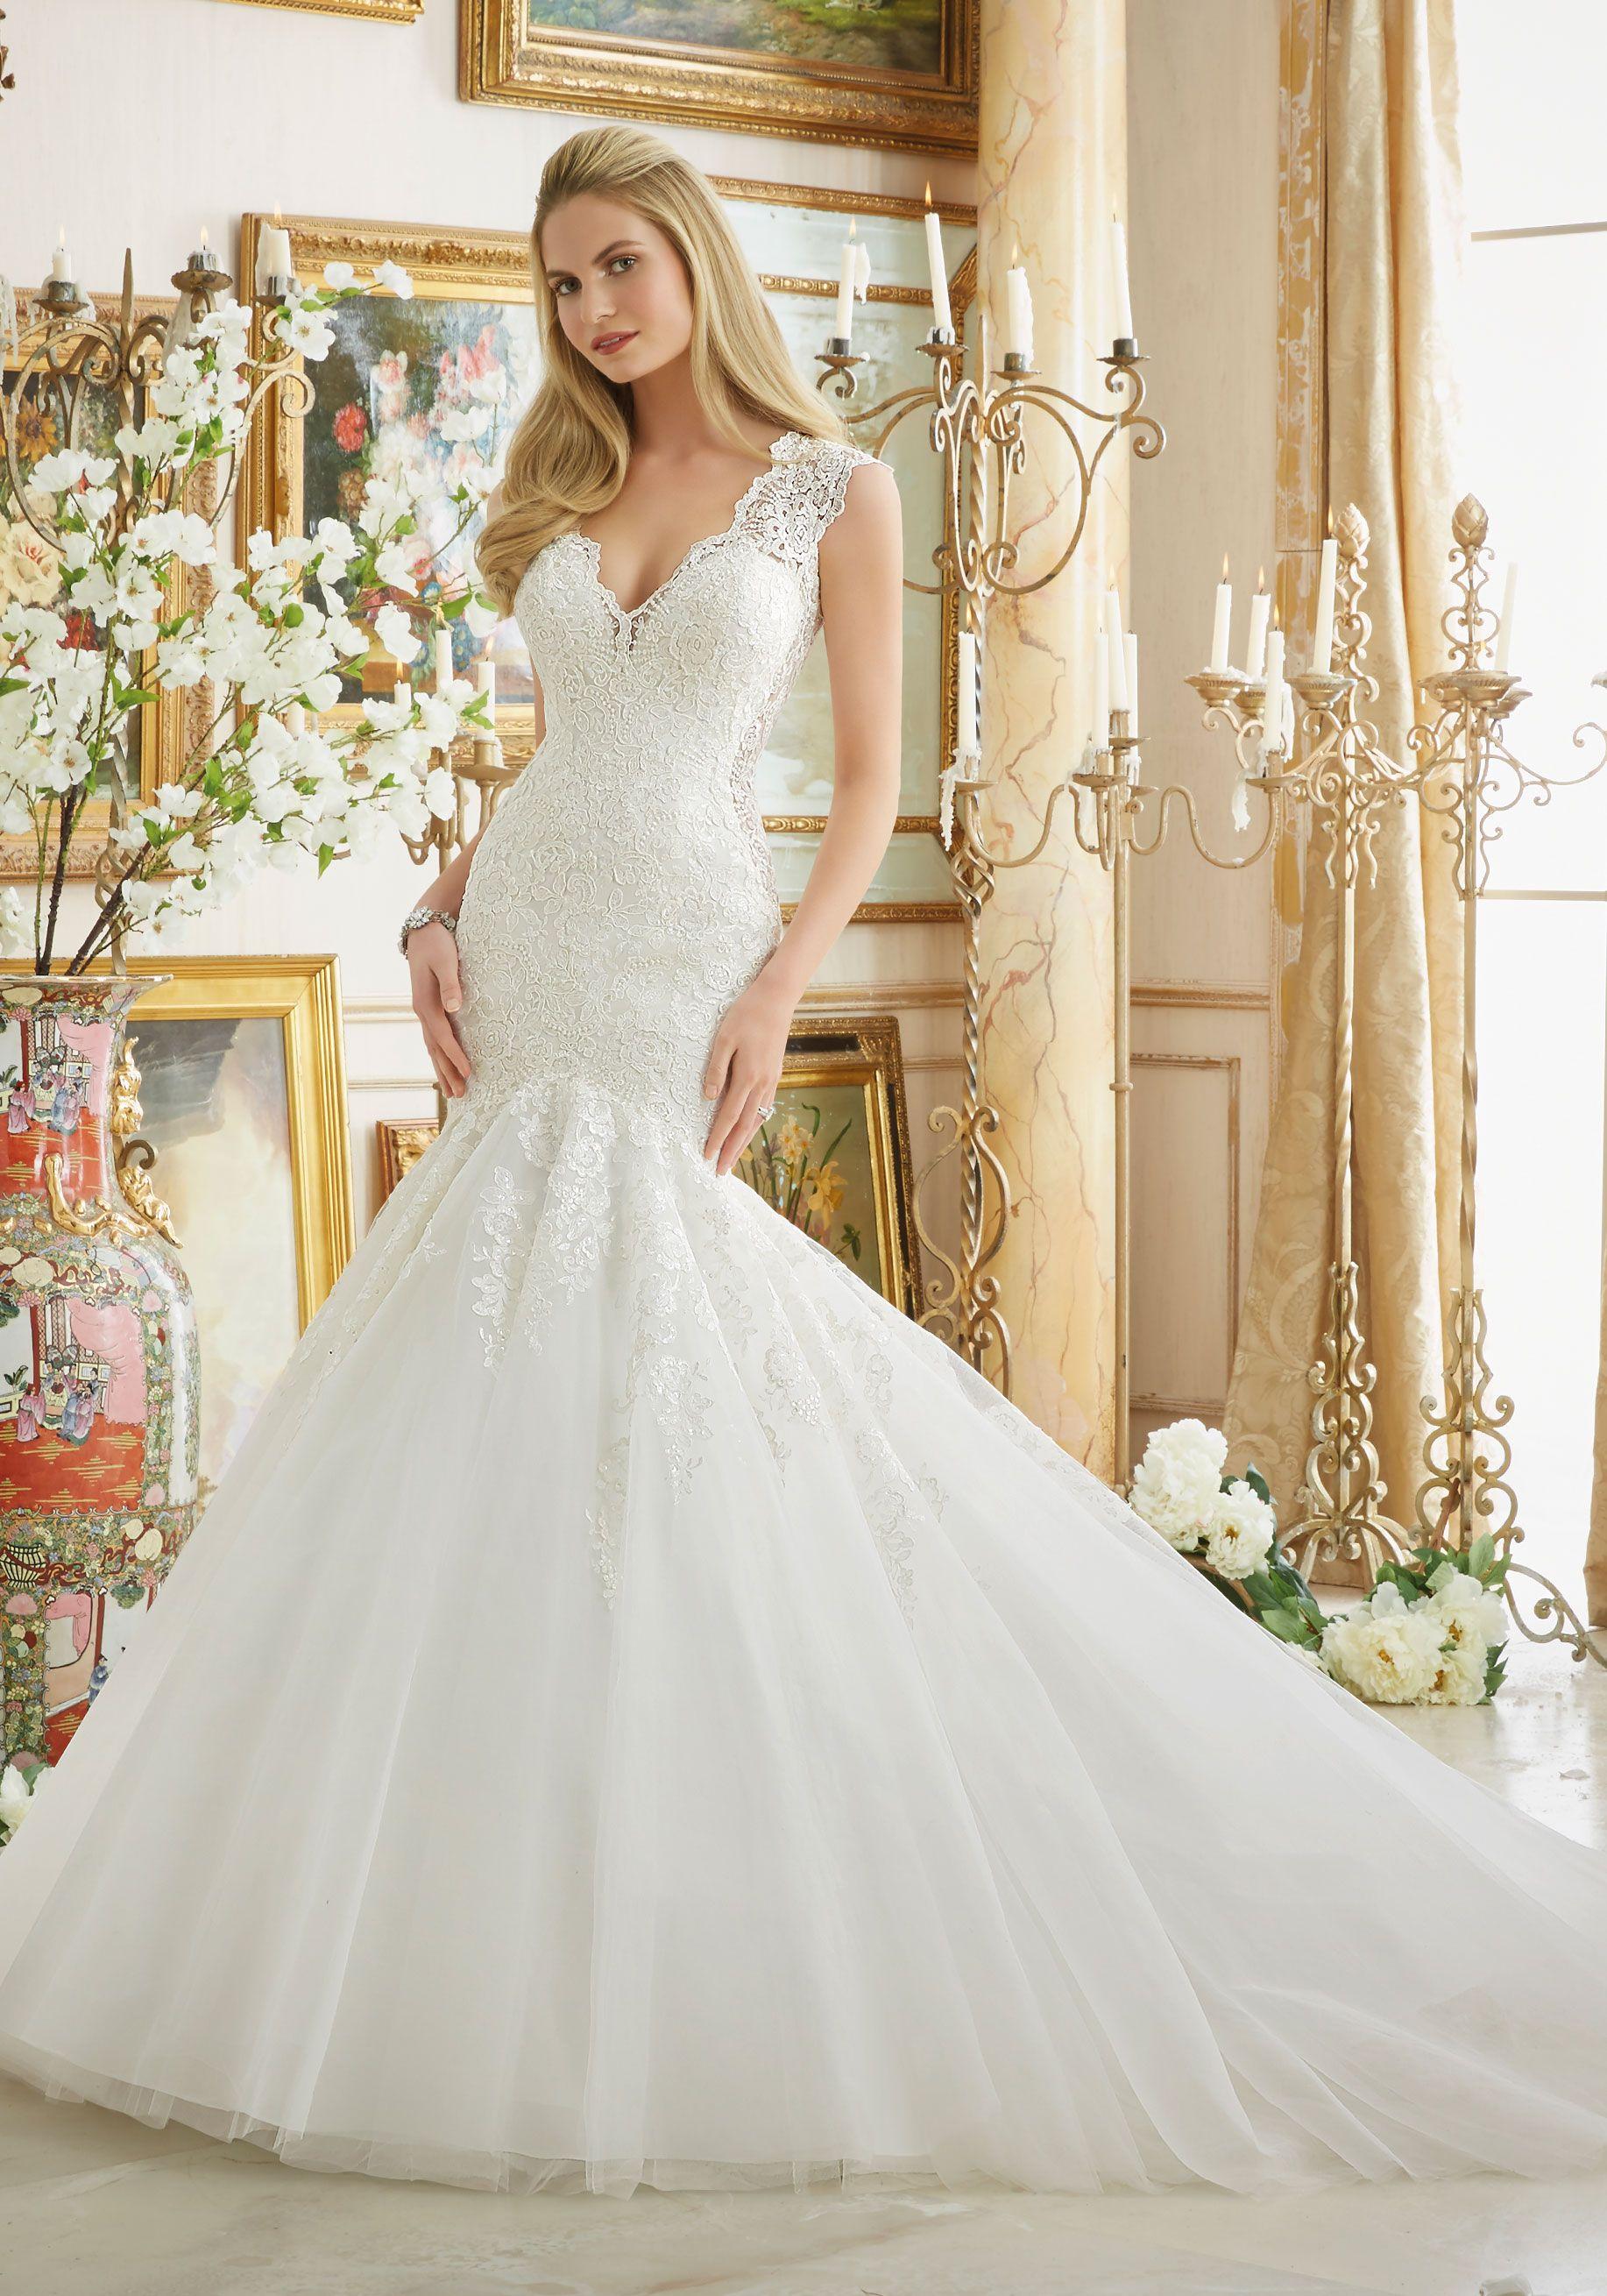 2923d98319c Mori Lee - 2882 Sexy Wedding Dresses